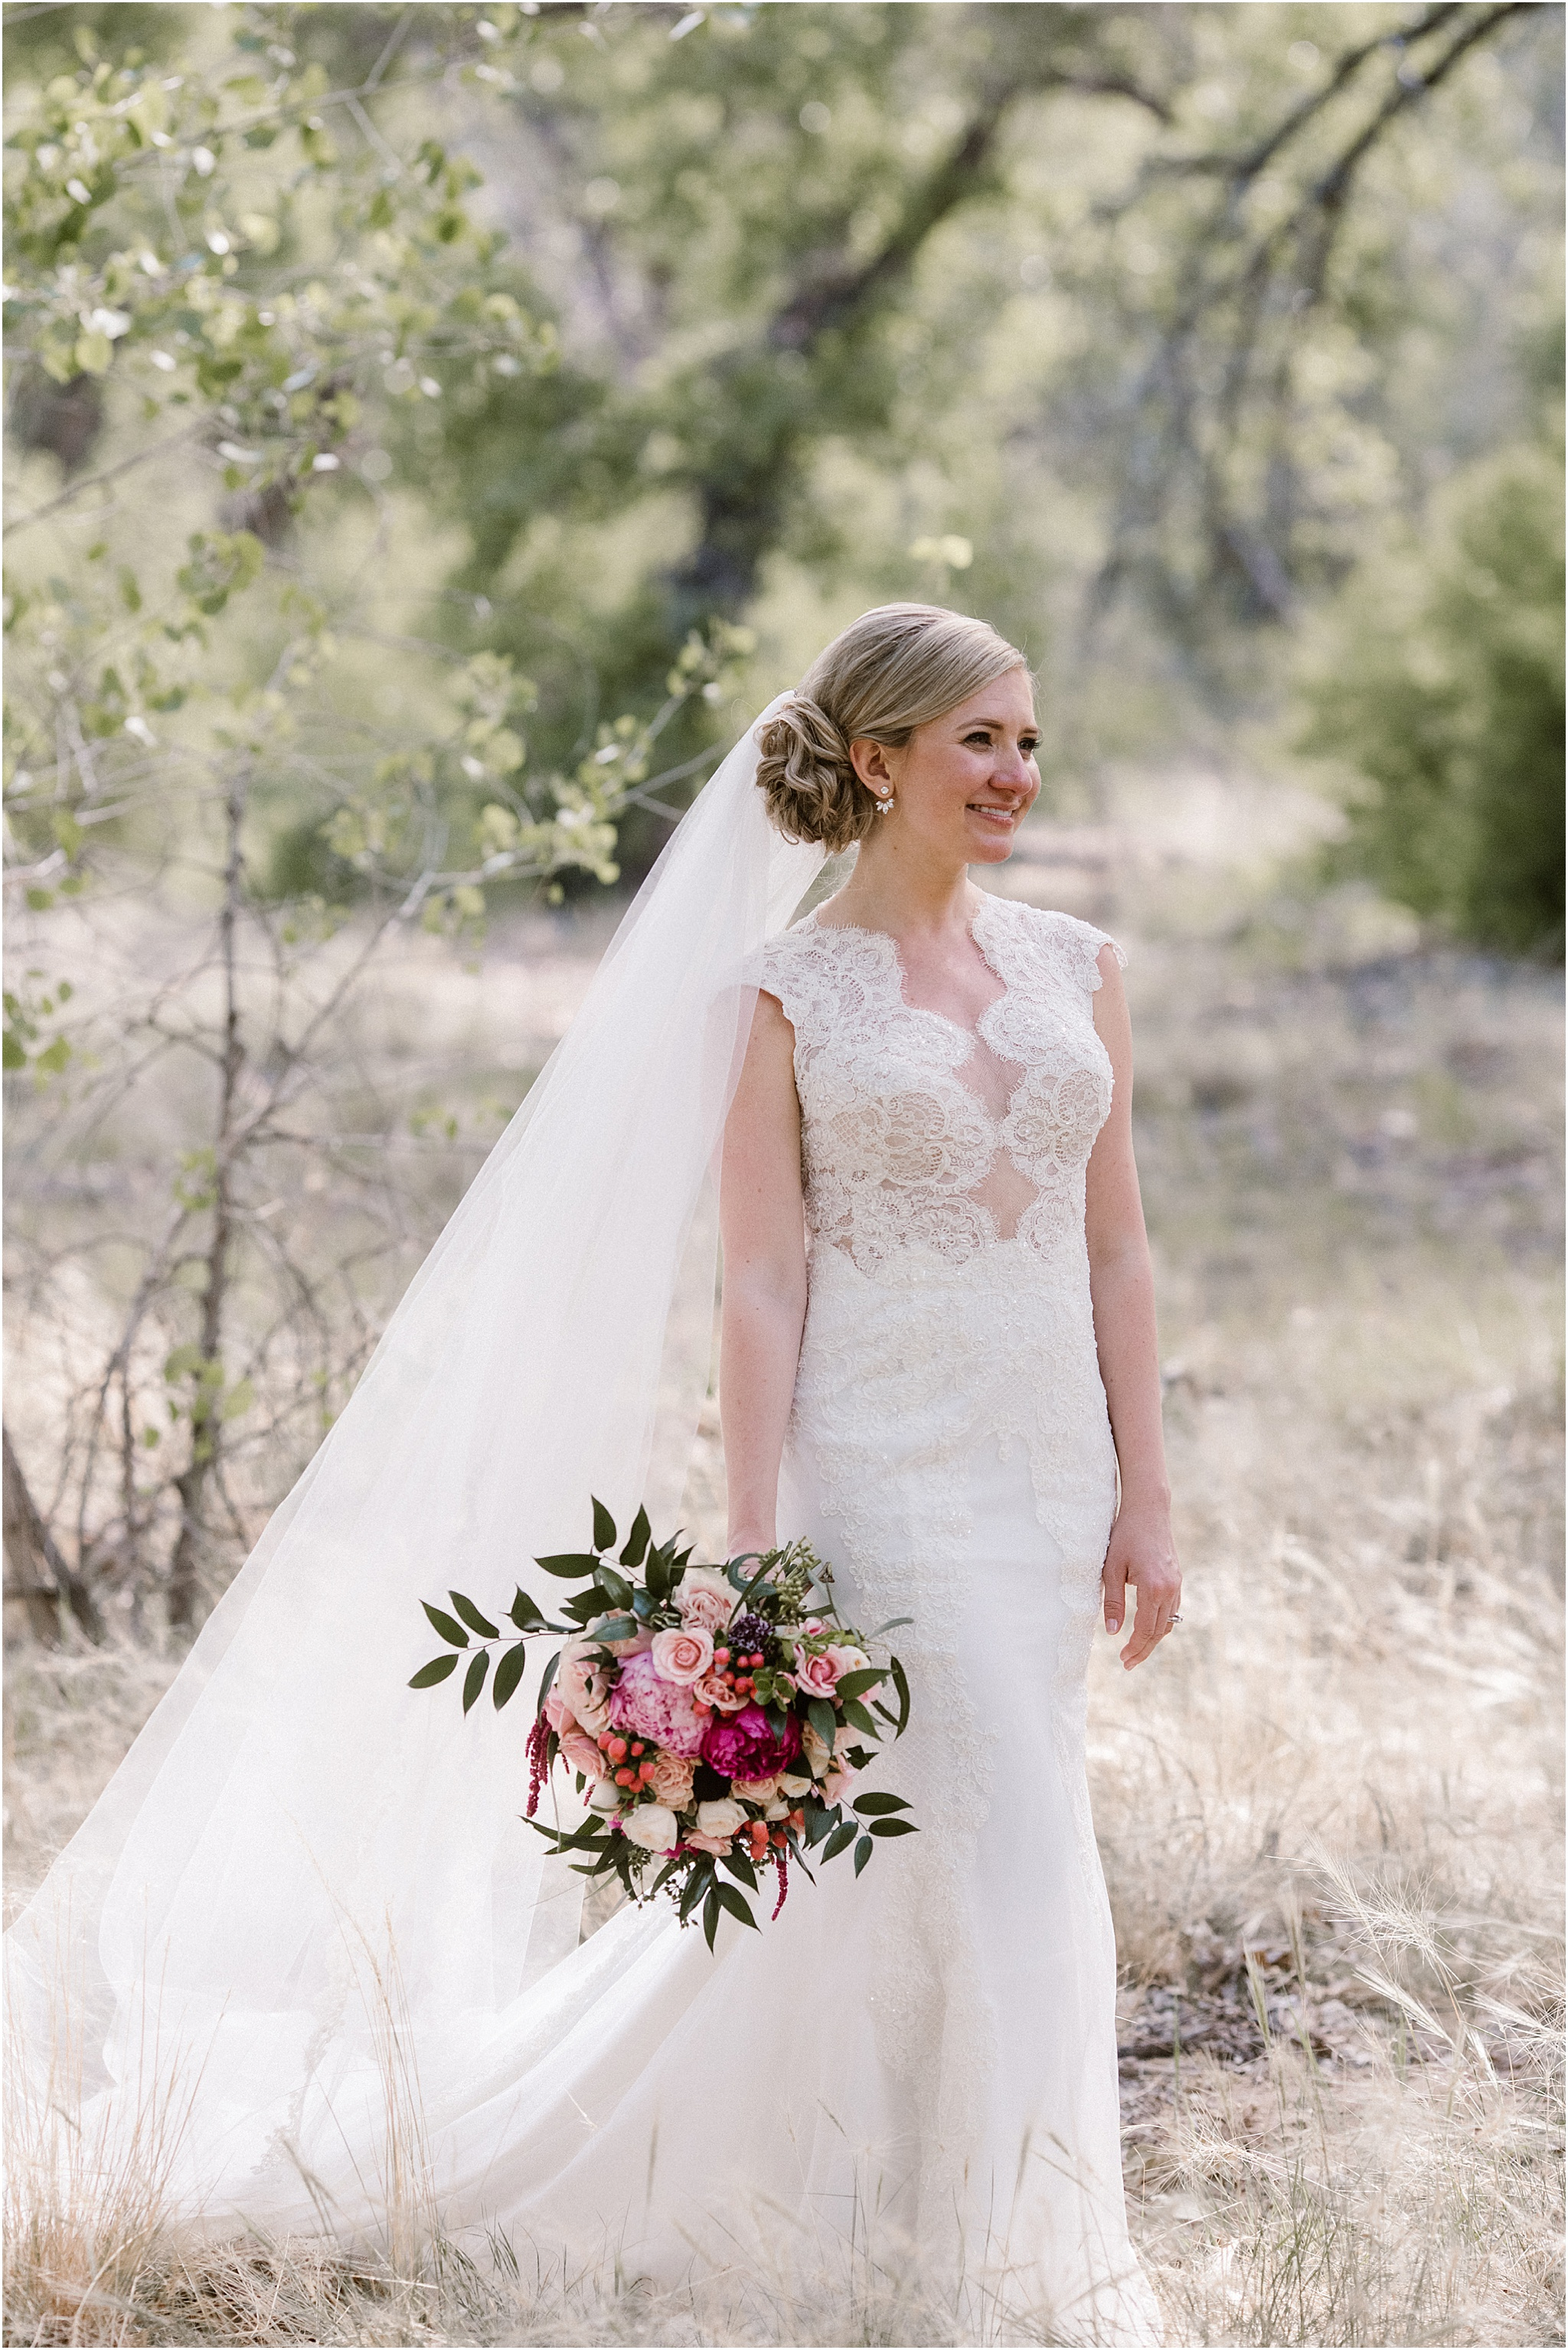 JENNA_JEROME_BLUE ROSE PHOTOGRAPHY_ABQ WEDDING_29